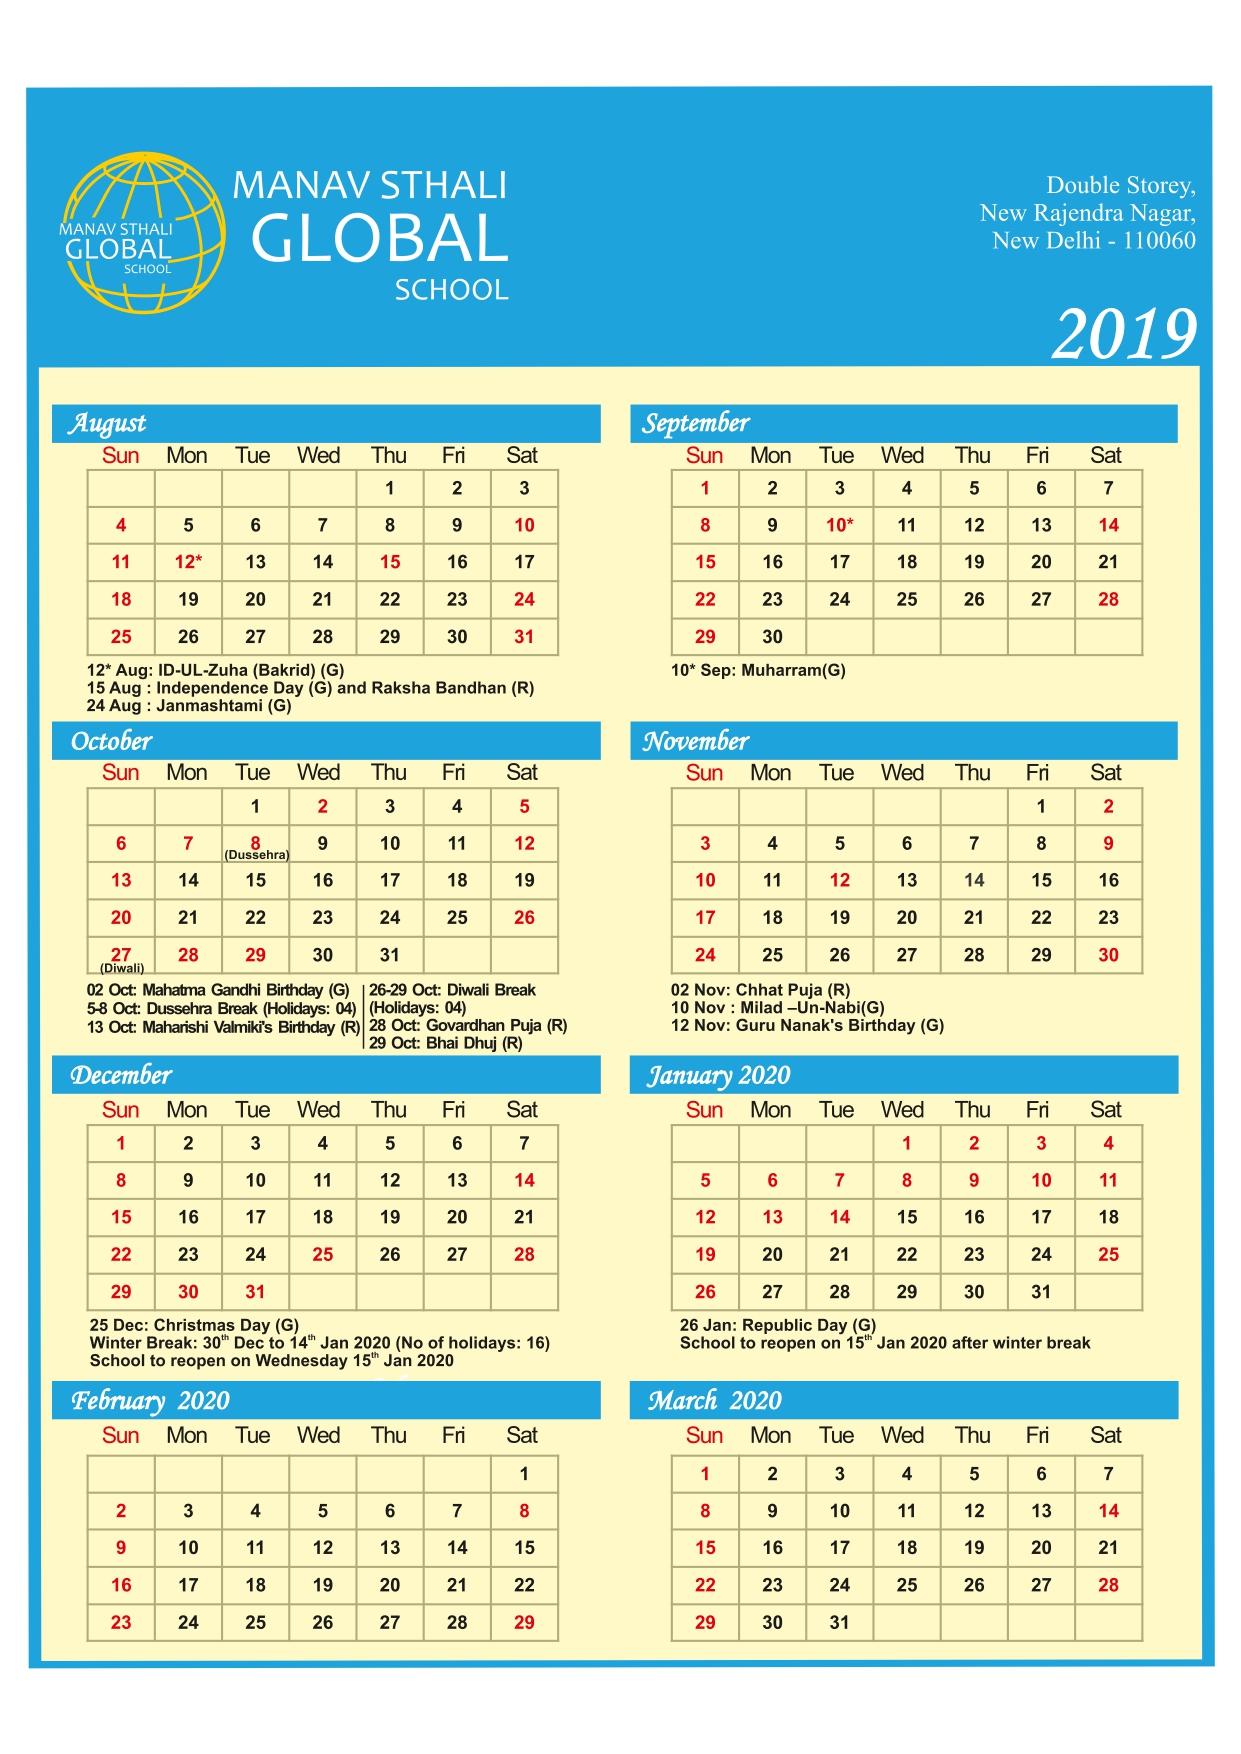 School Holidays – Manav Sthali Global School For St. Charles Community College Summer 2021 Calendar